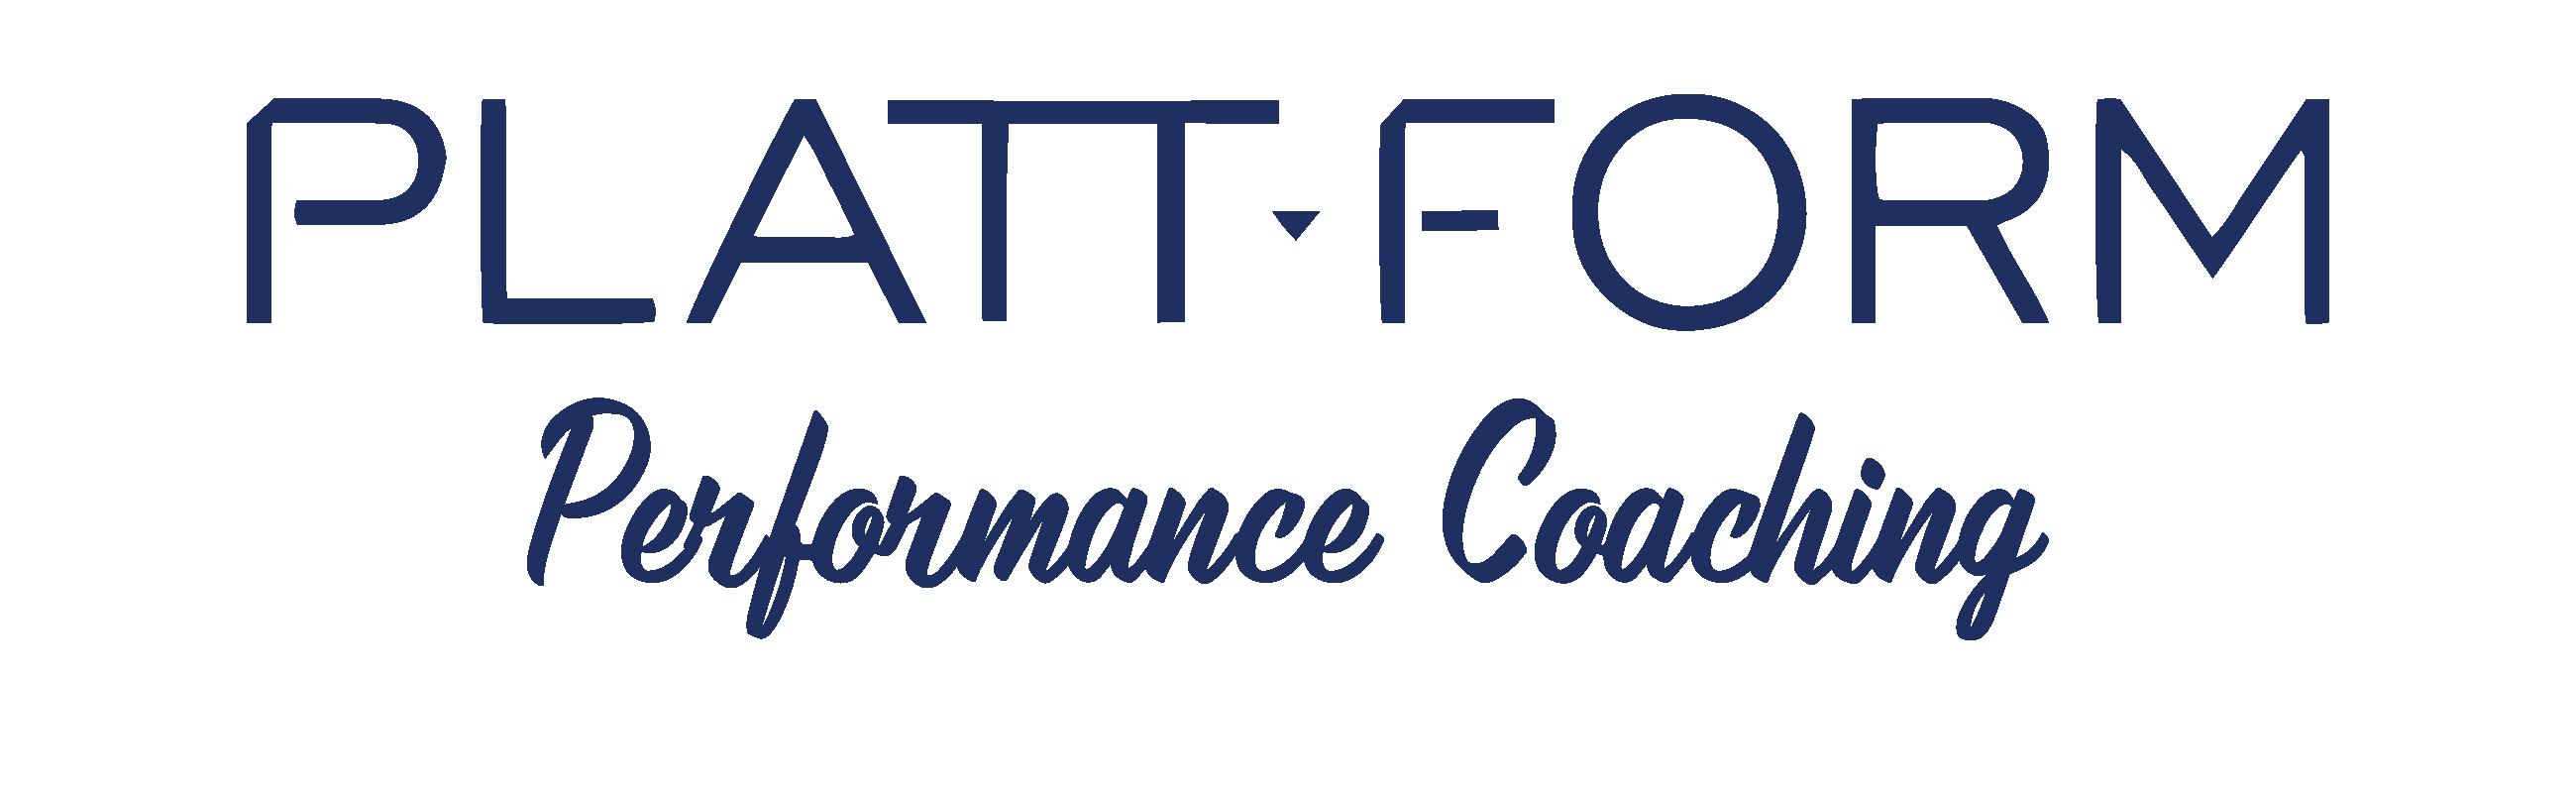 Plattform Performance Coaching - Logo